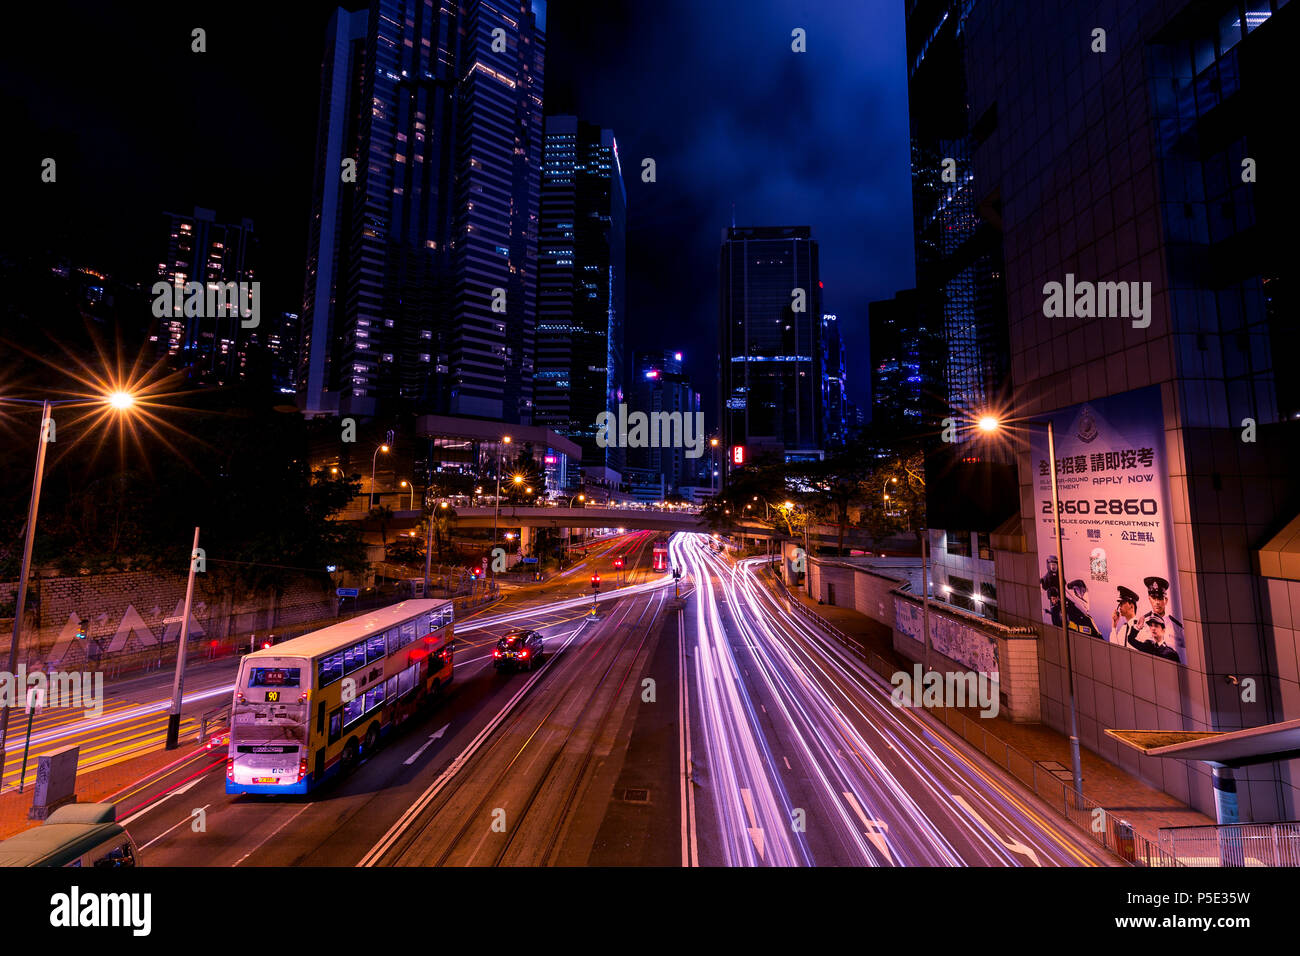 HONG KONG - JUNE 02, 2018: Light trails of traffic at night in central Hong Kong Stock Photo